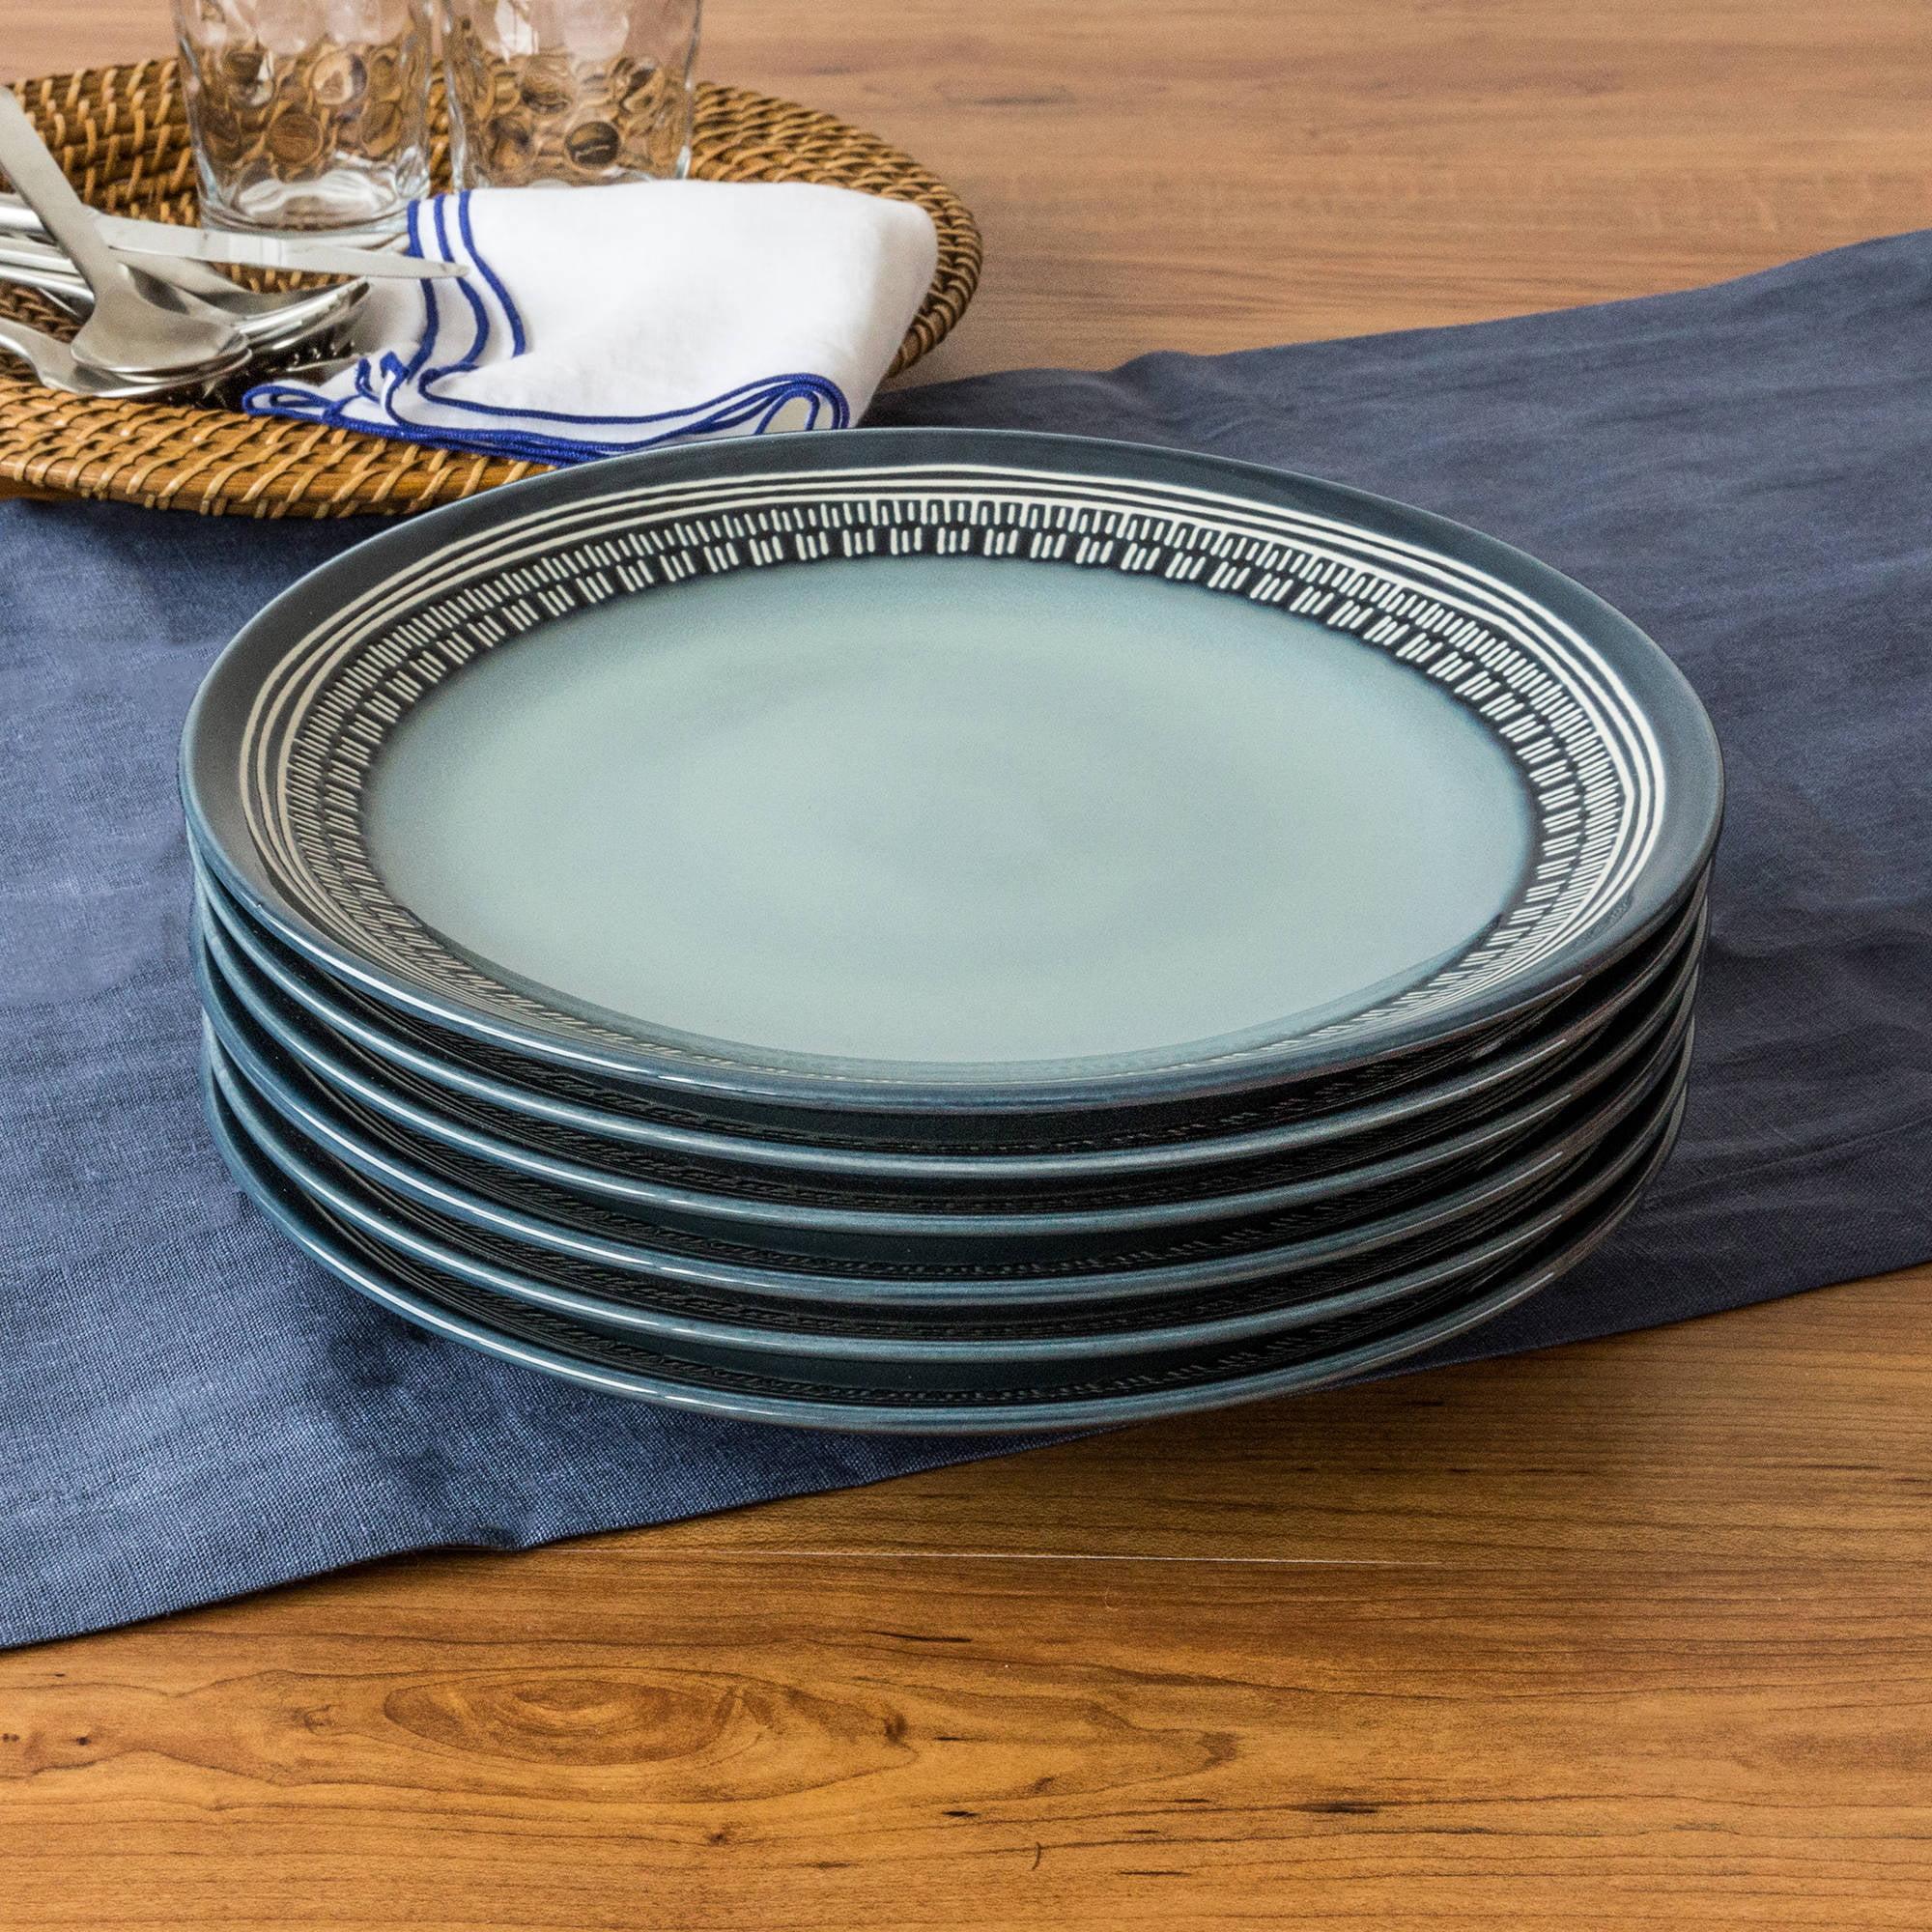 Better Homes and Gardens Teal Medallion Dinner Plates, Teal, Set of 6